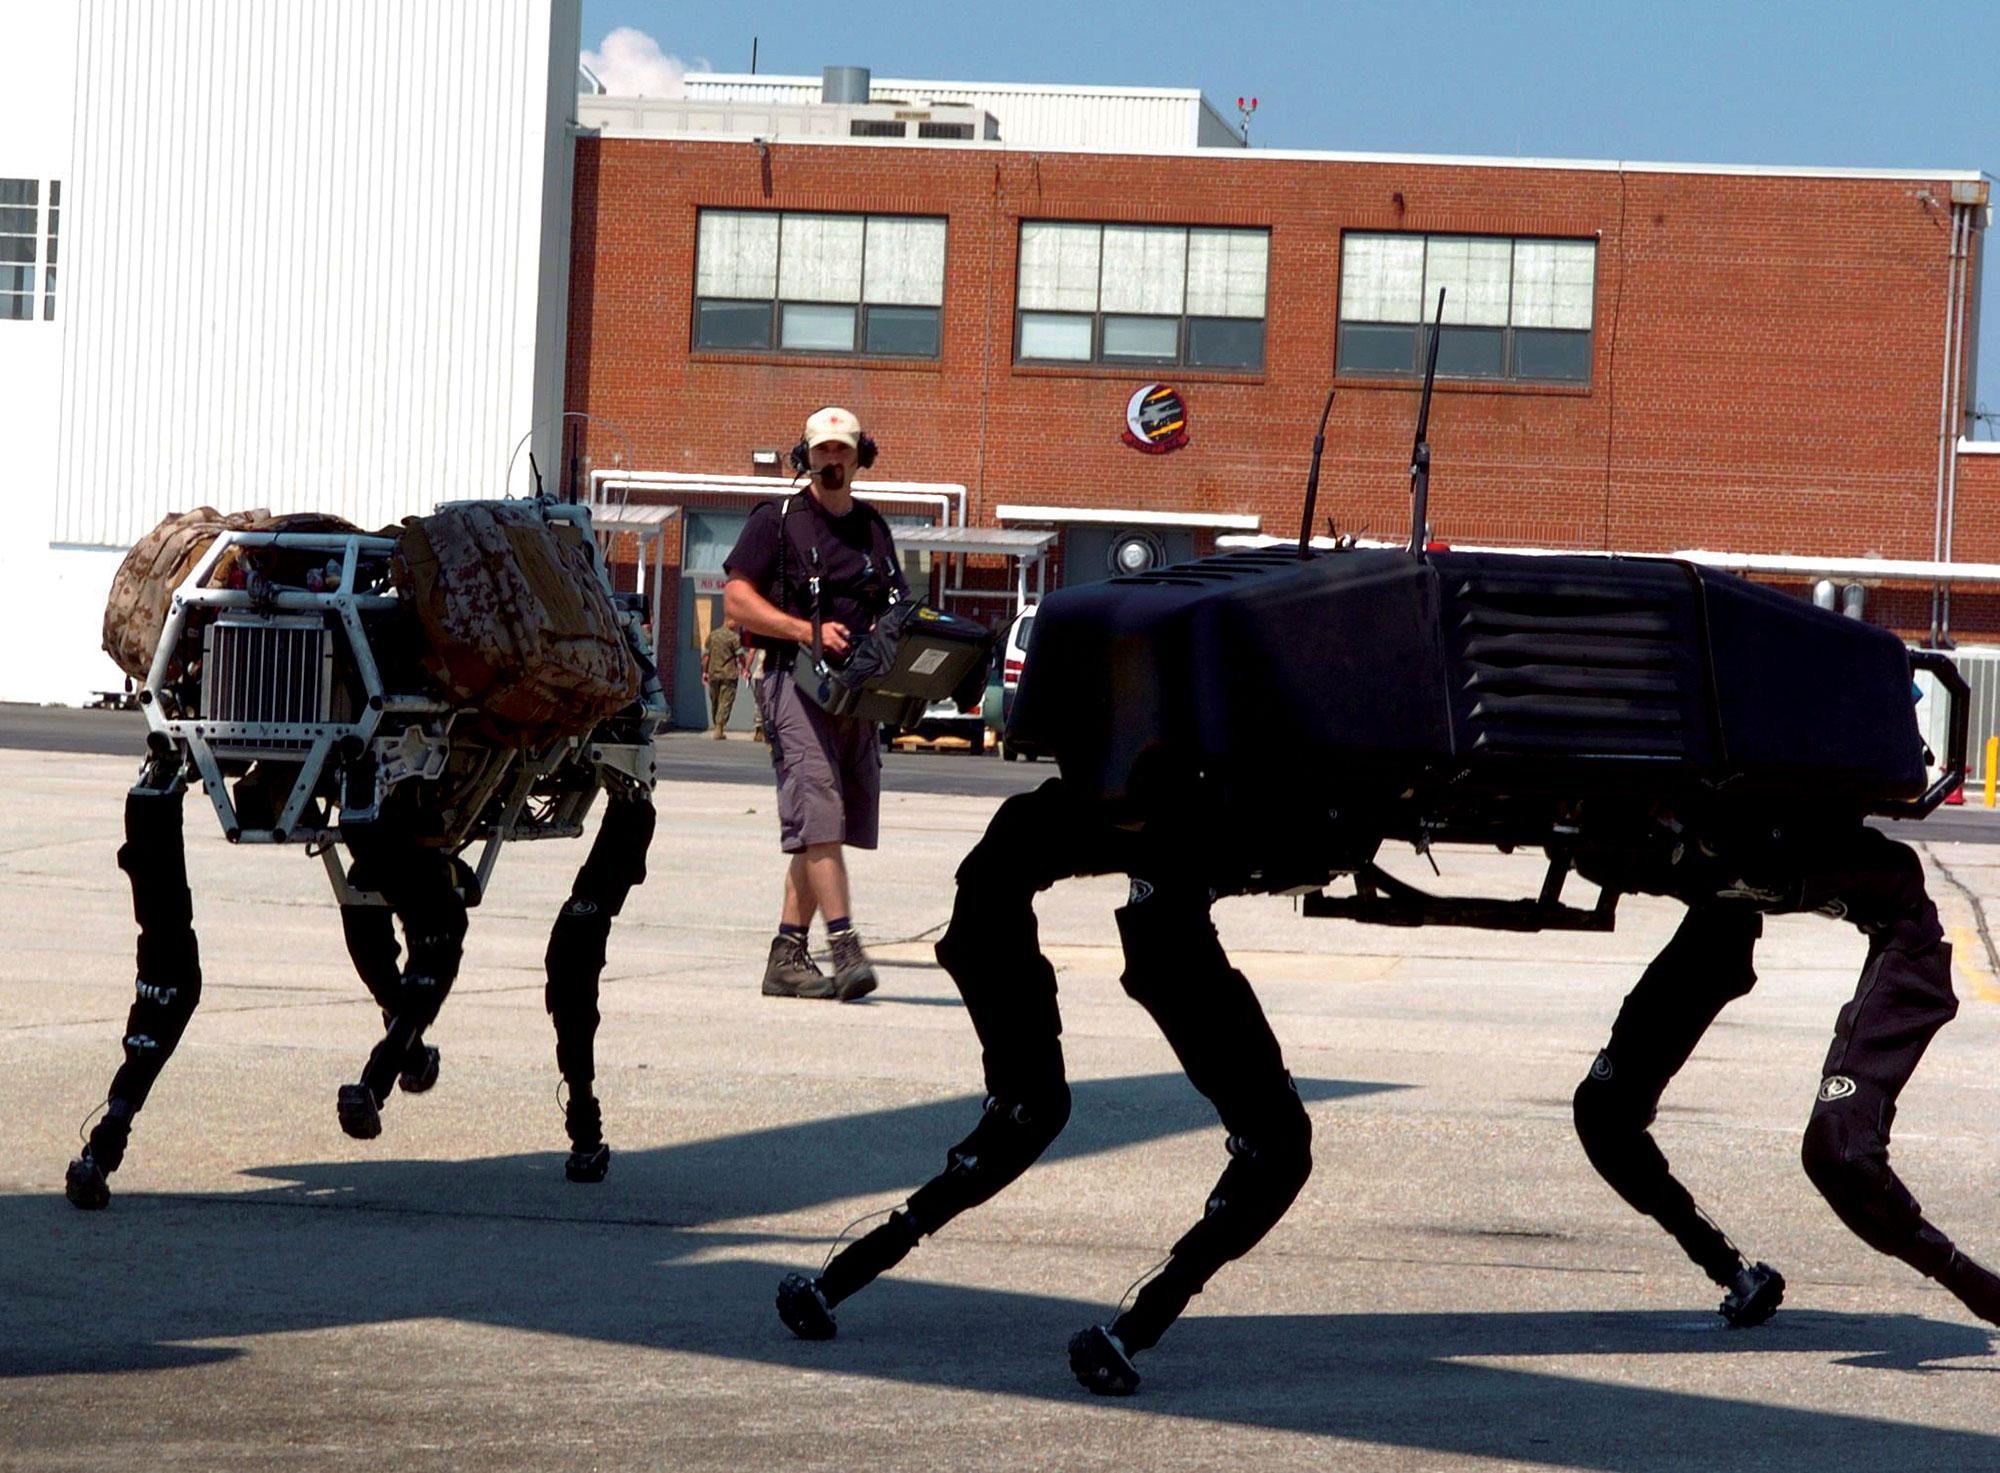 http://upload.wikimedia.org/wikipedia/commons/d/dd/Big_dog_military_robots.jpg